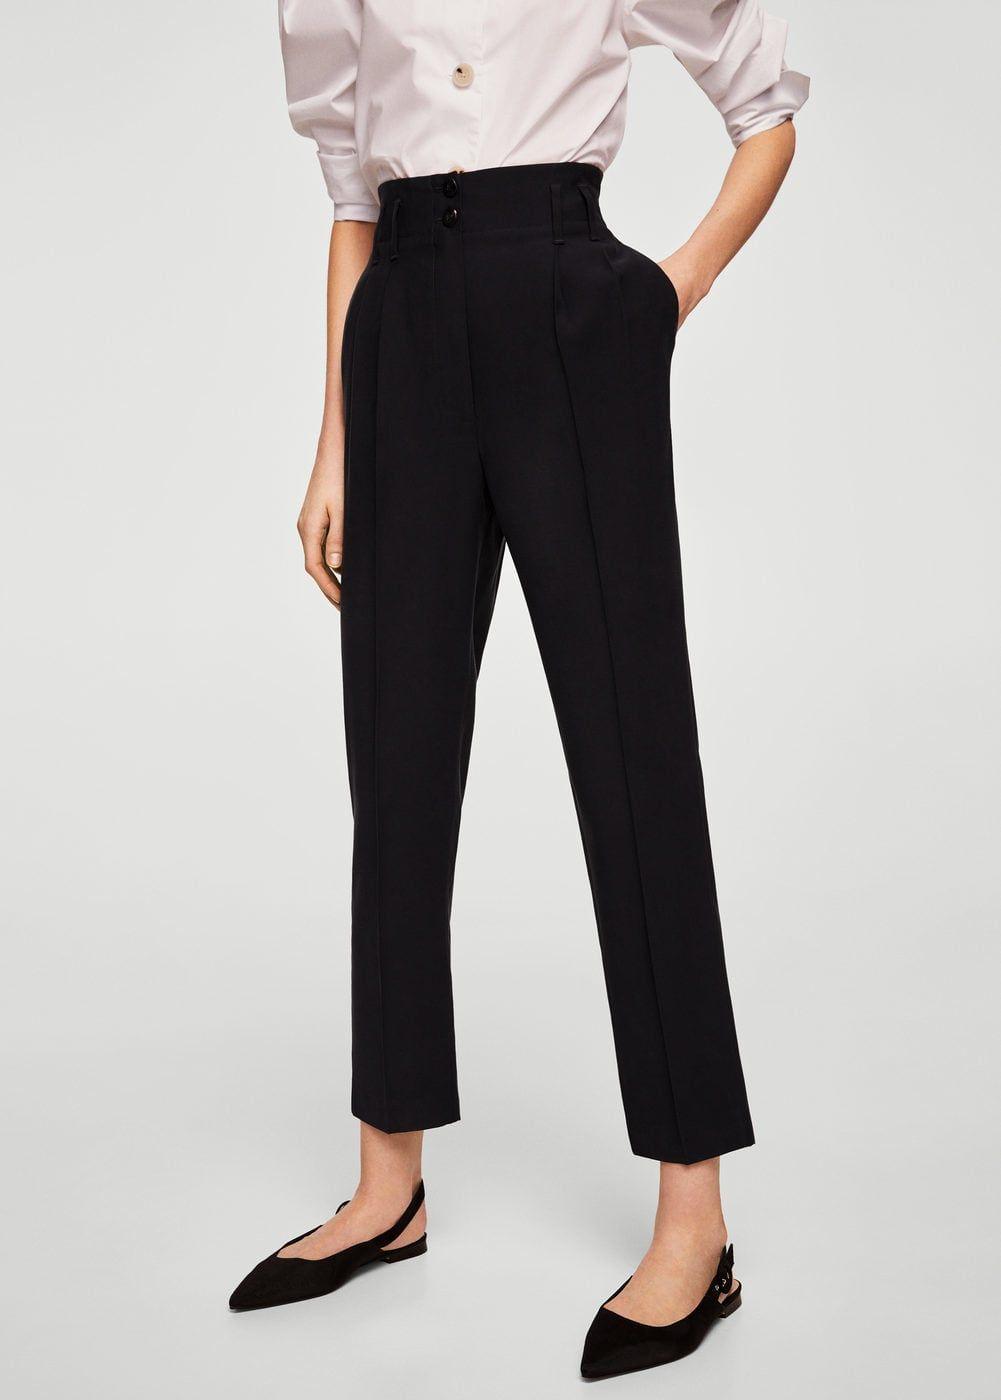 Black Trouser Pants For Ladies